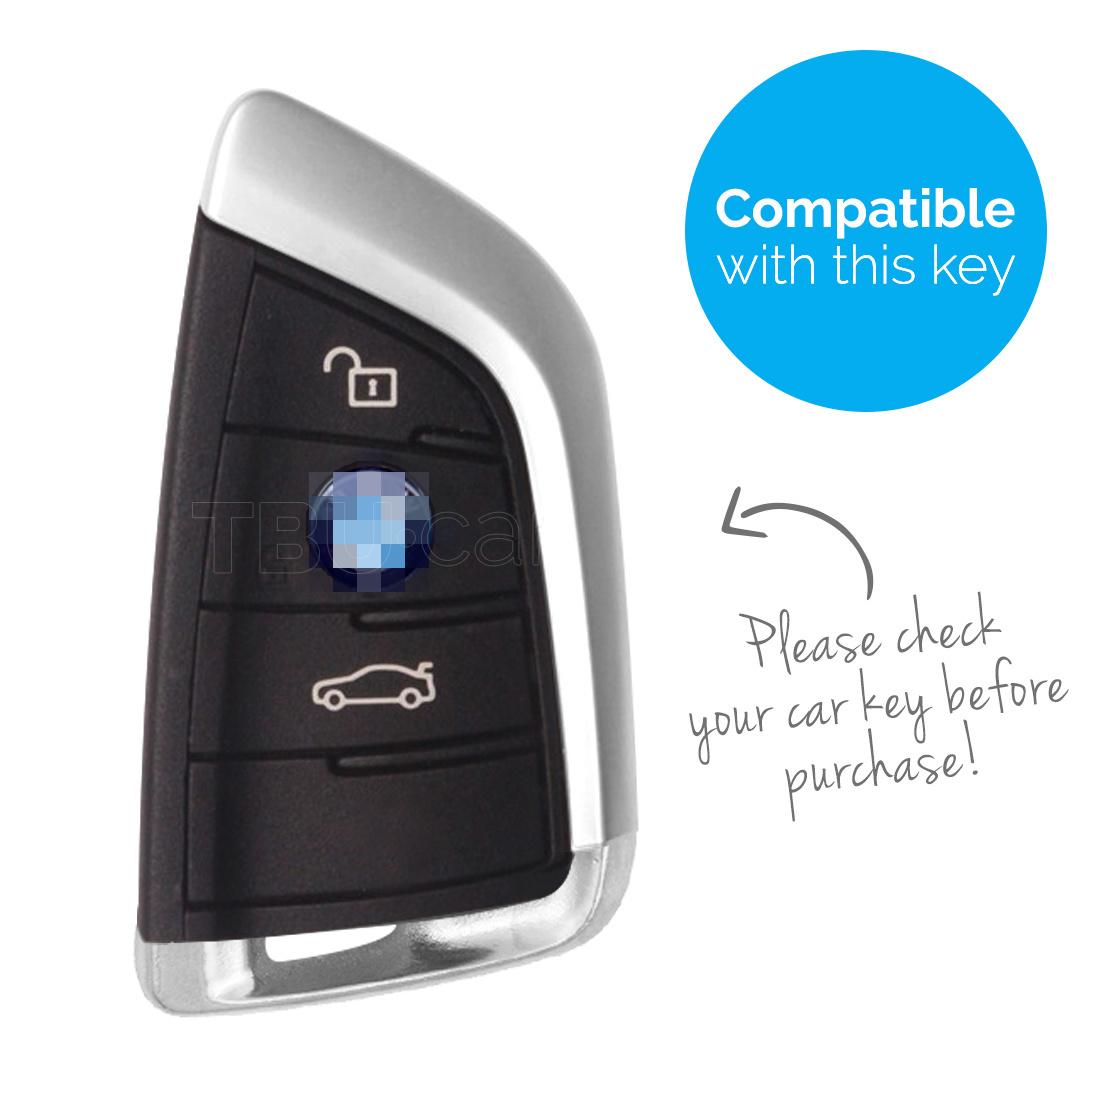 TBU car TBU car Autoschlüssel Hülle kompatibel mit BMW 3 Tasten (Keyless Entry) - Schutzhülle aus TPU - Auto Schlüsselhülle Cover in Roségold